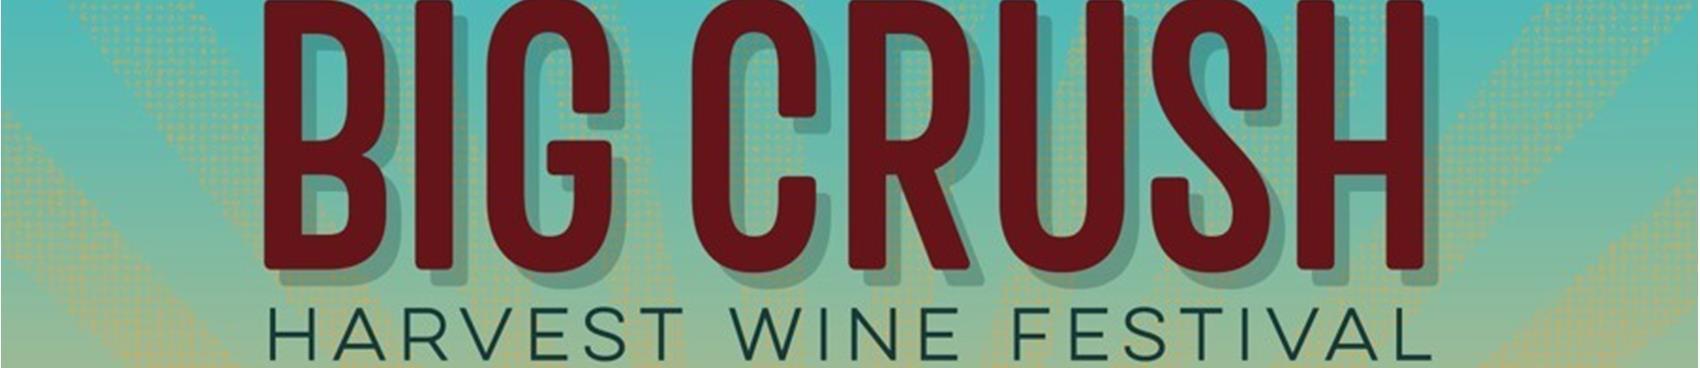 2021 Big Crush Harvest Wine Festival